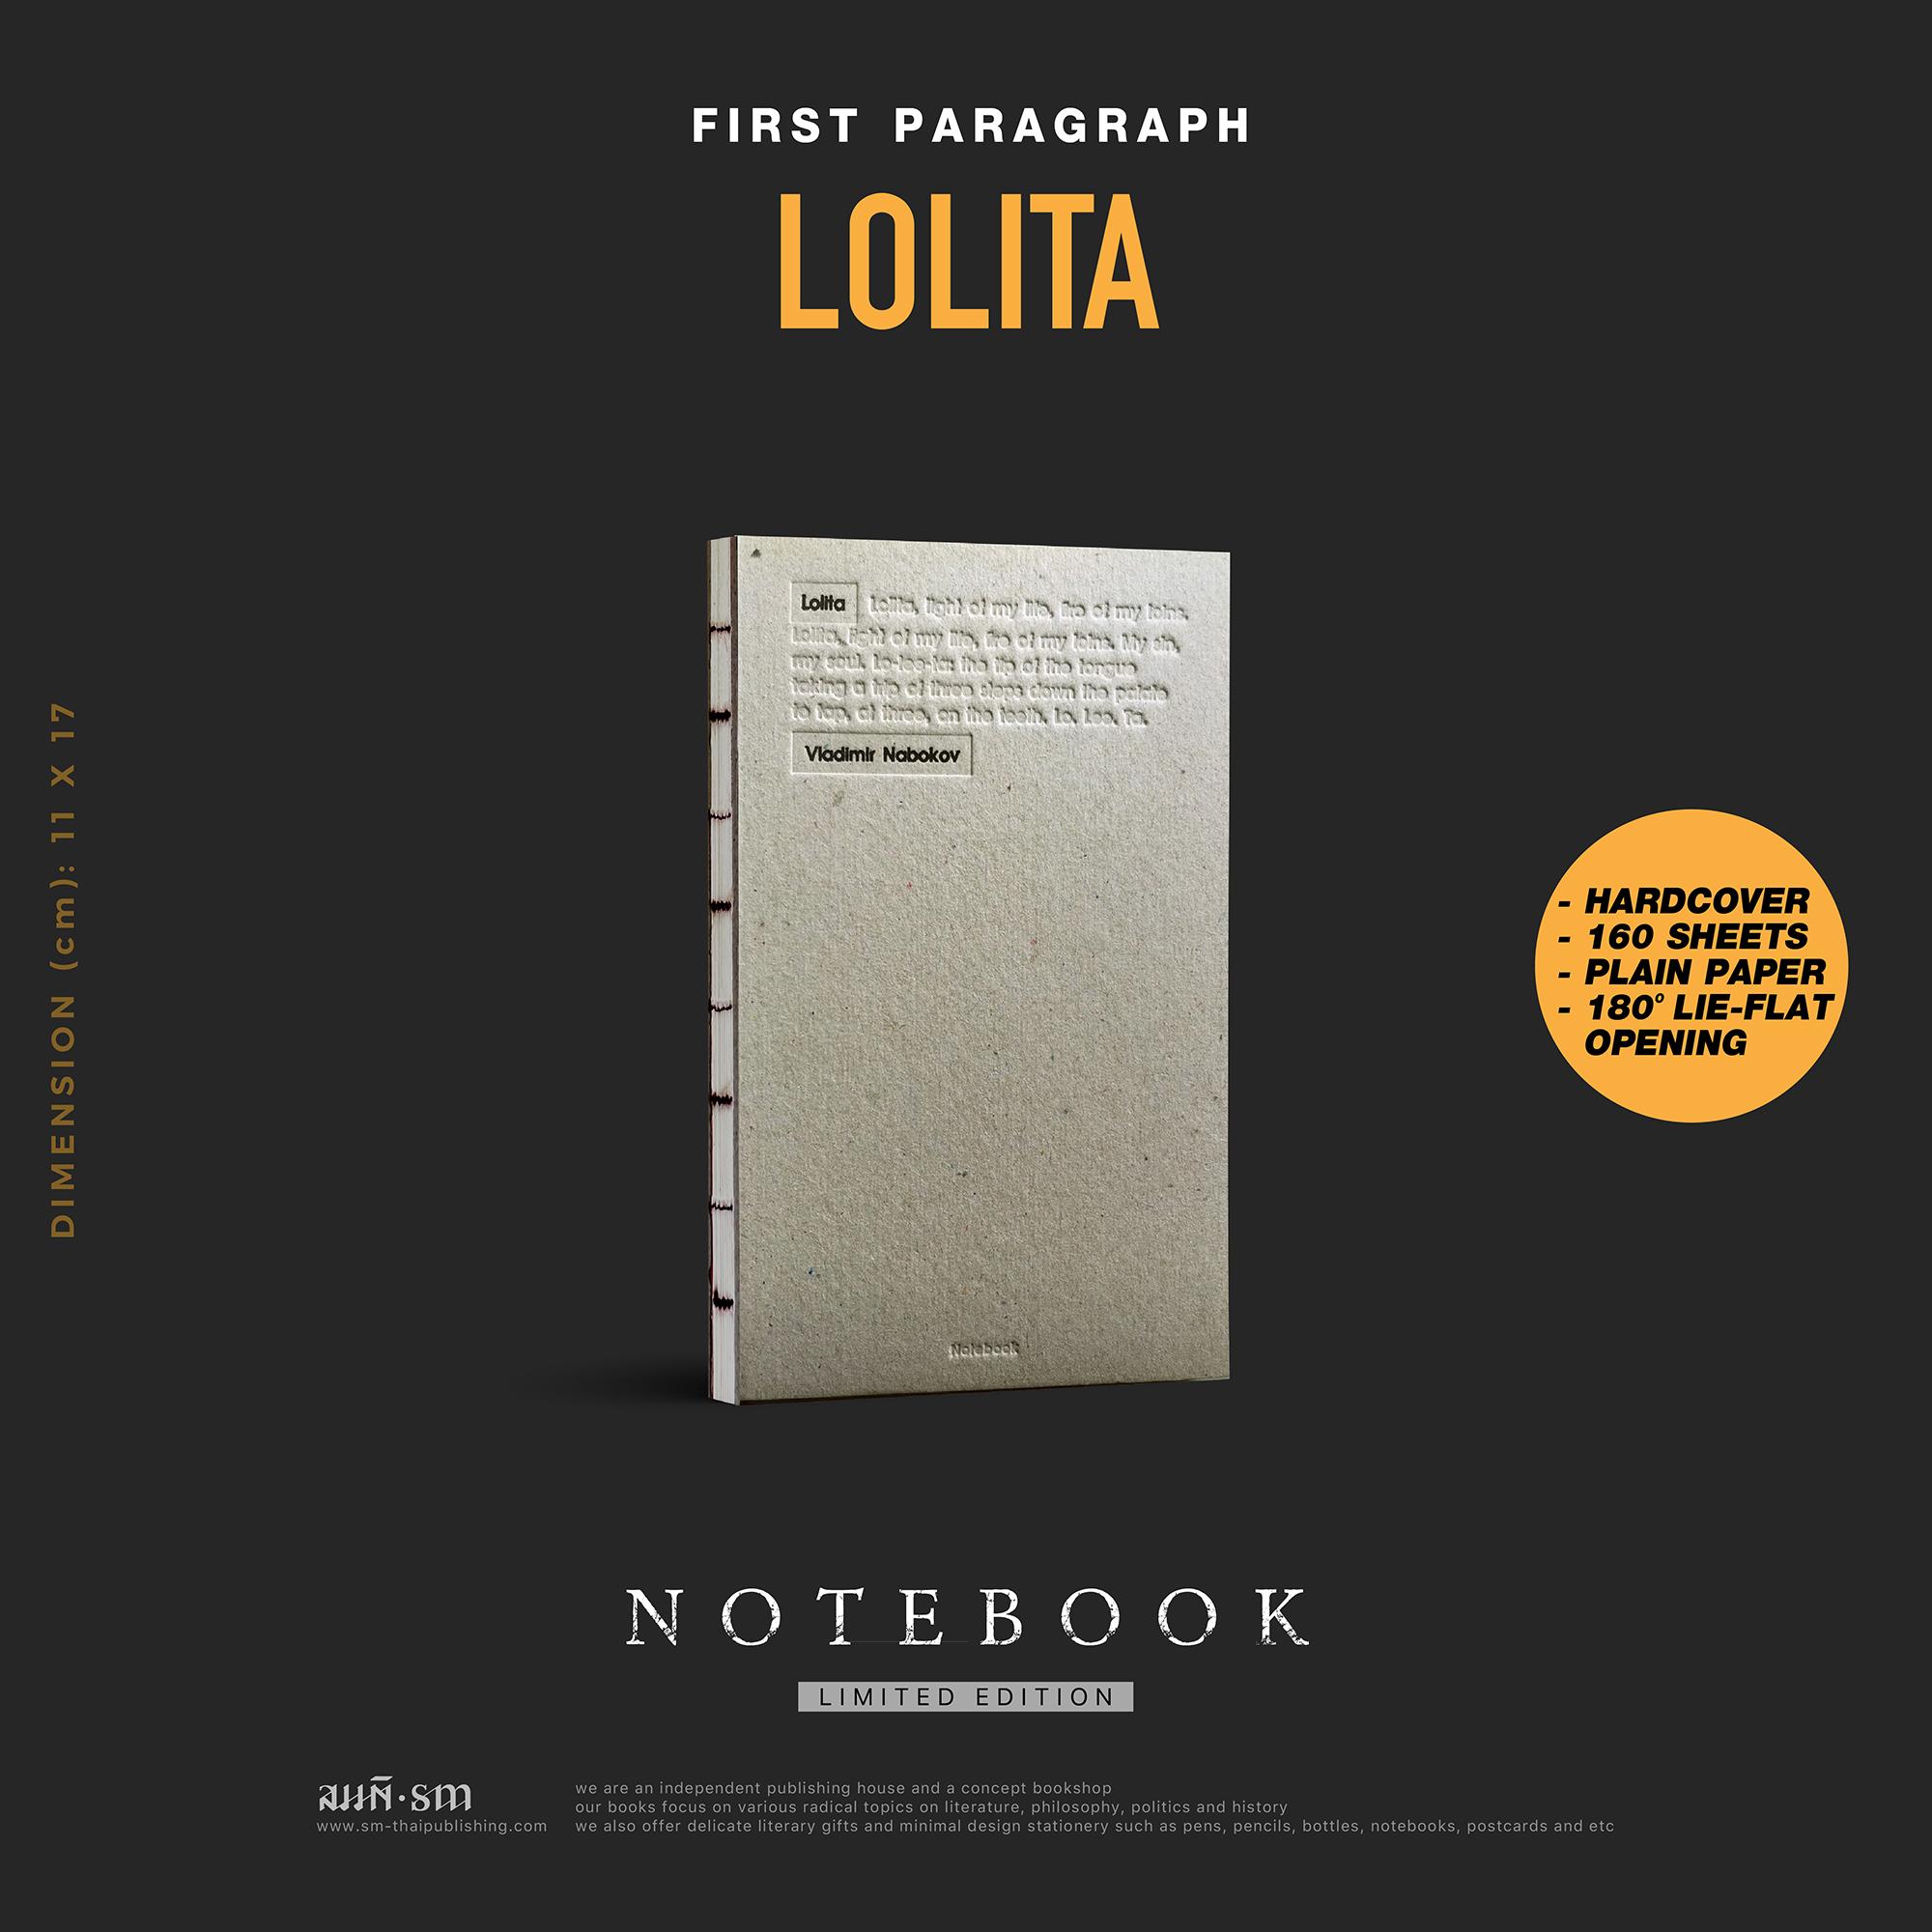 Lolita, Nabokov - Notebook | สมุดบันทึก ย่อหน้าแรกวรรณกรรม